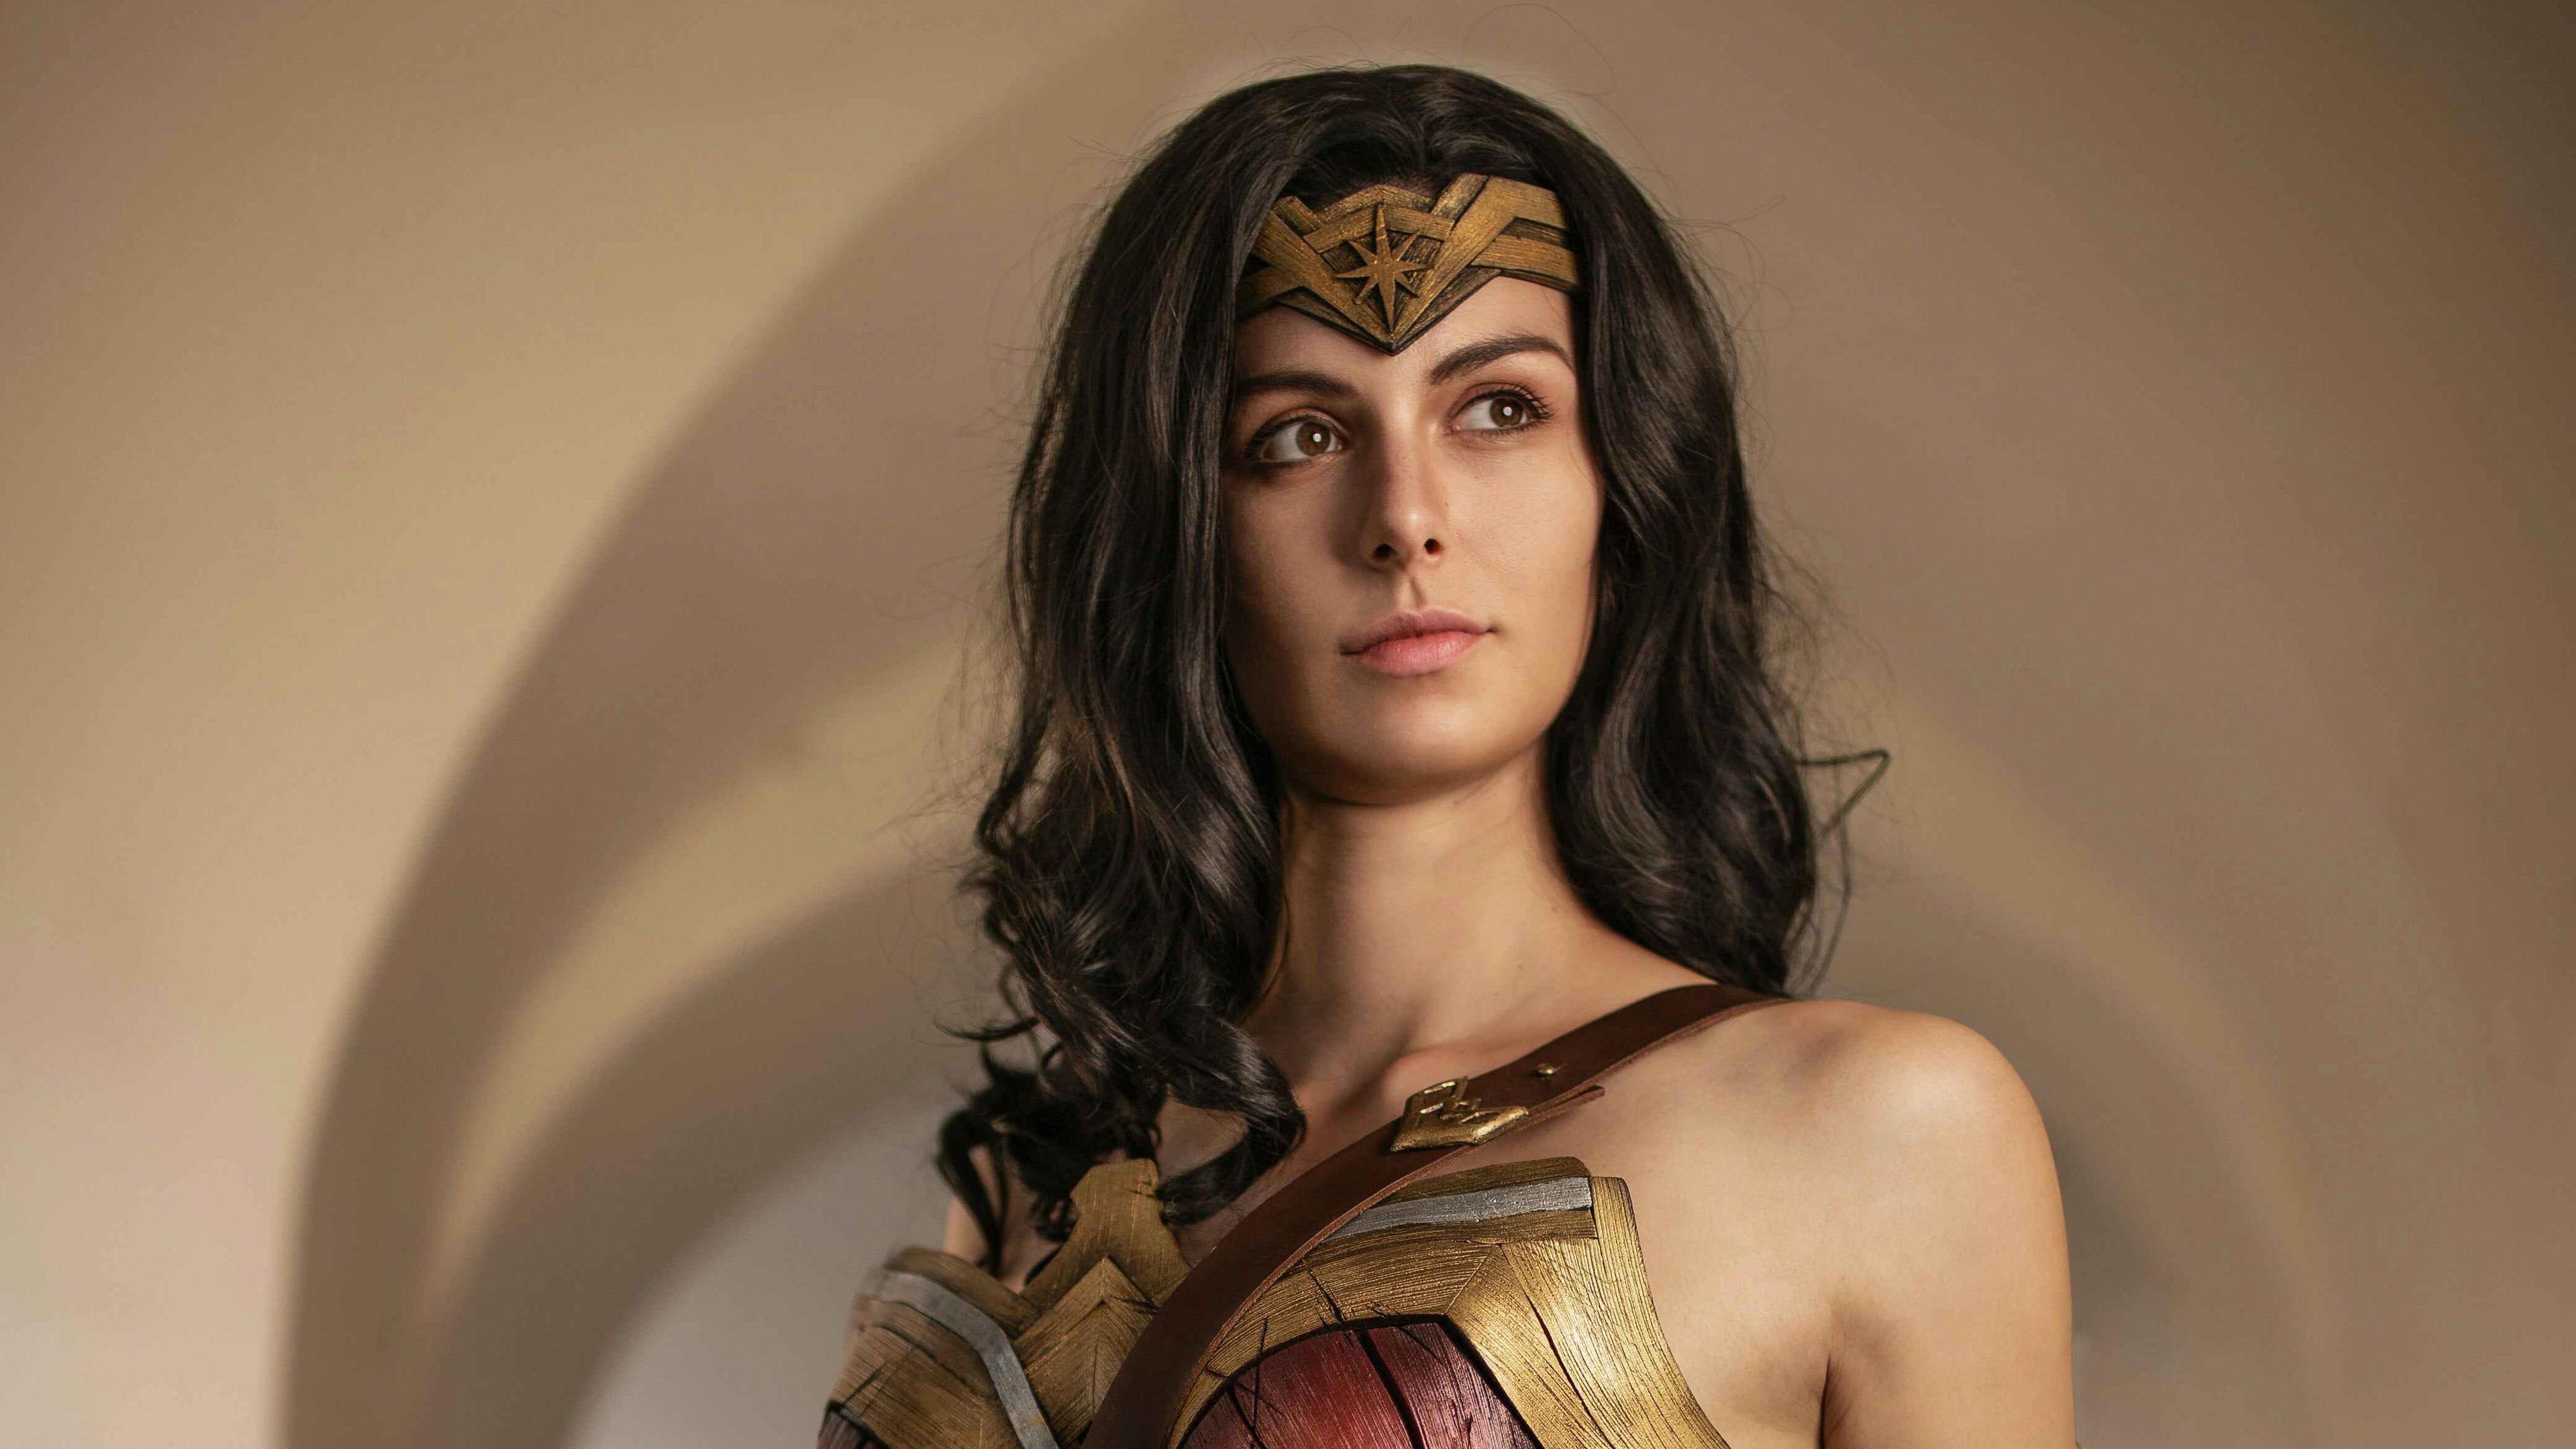 wonder woman cosplay 2019 1569186361 - Wonder Woman Cosplay 2019 - wonder woman wallpapers, superheroes wallpapers, hd-wallpapers, cosplay wallpapers, 4k-wallpapers